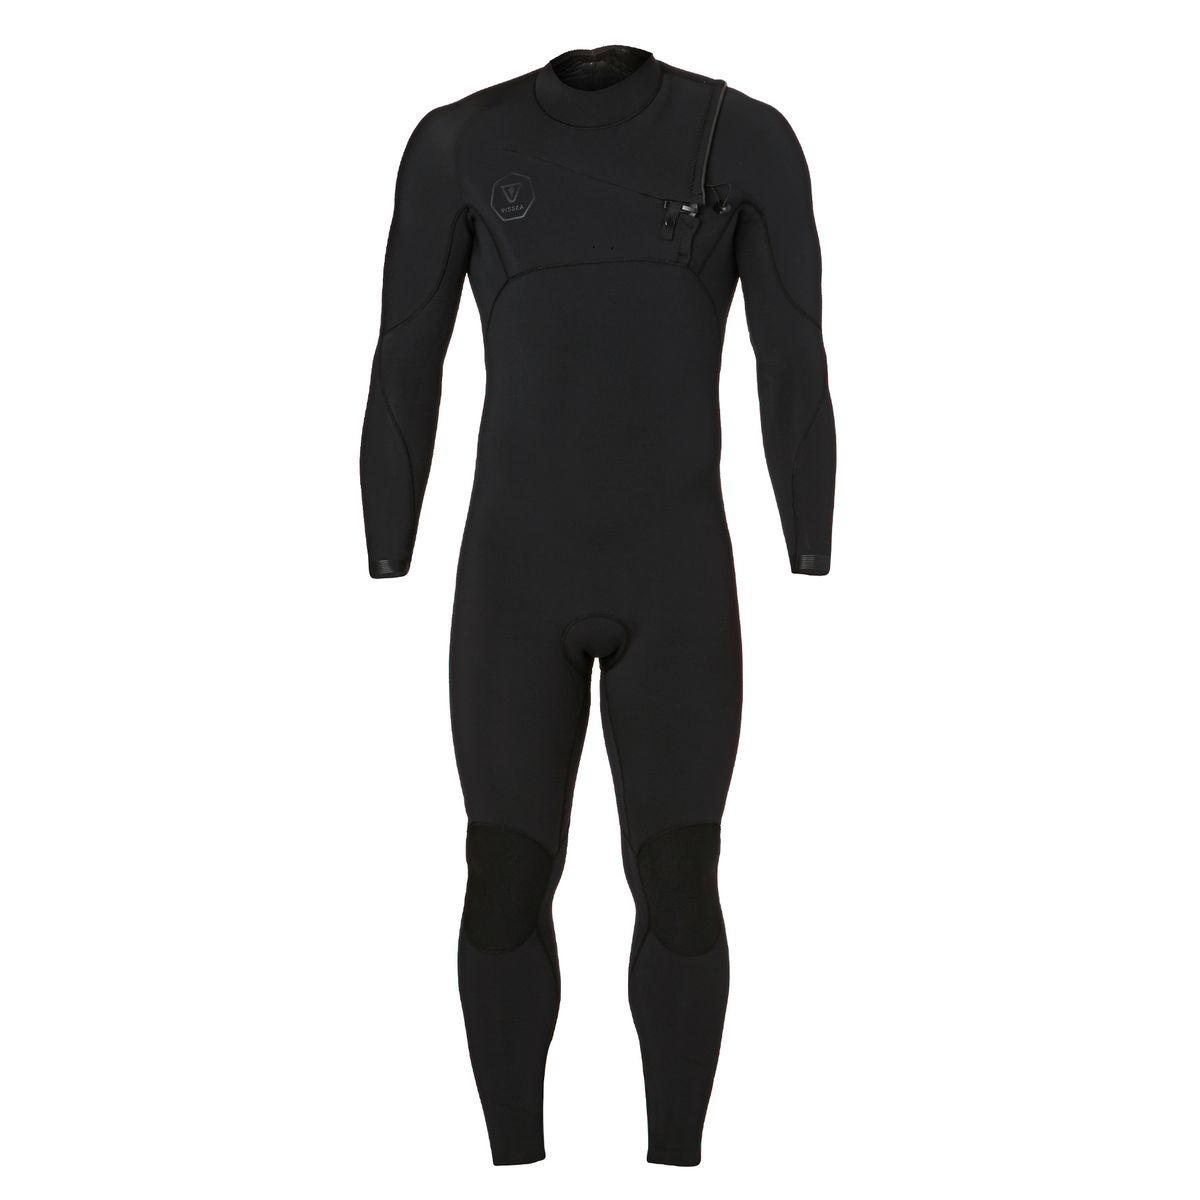 Vissla Seven Seas 5/4mm Chest Zip Wetsuit - Stealth